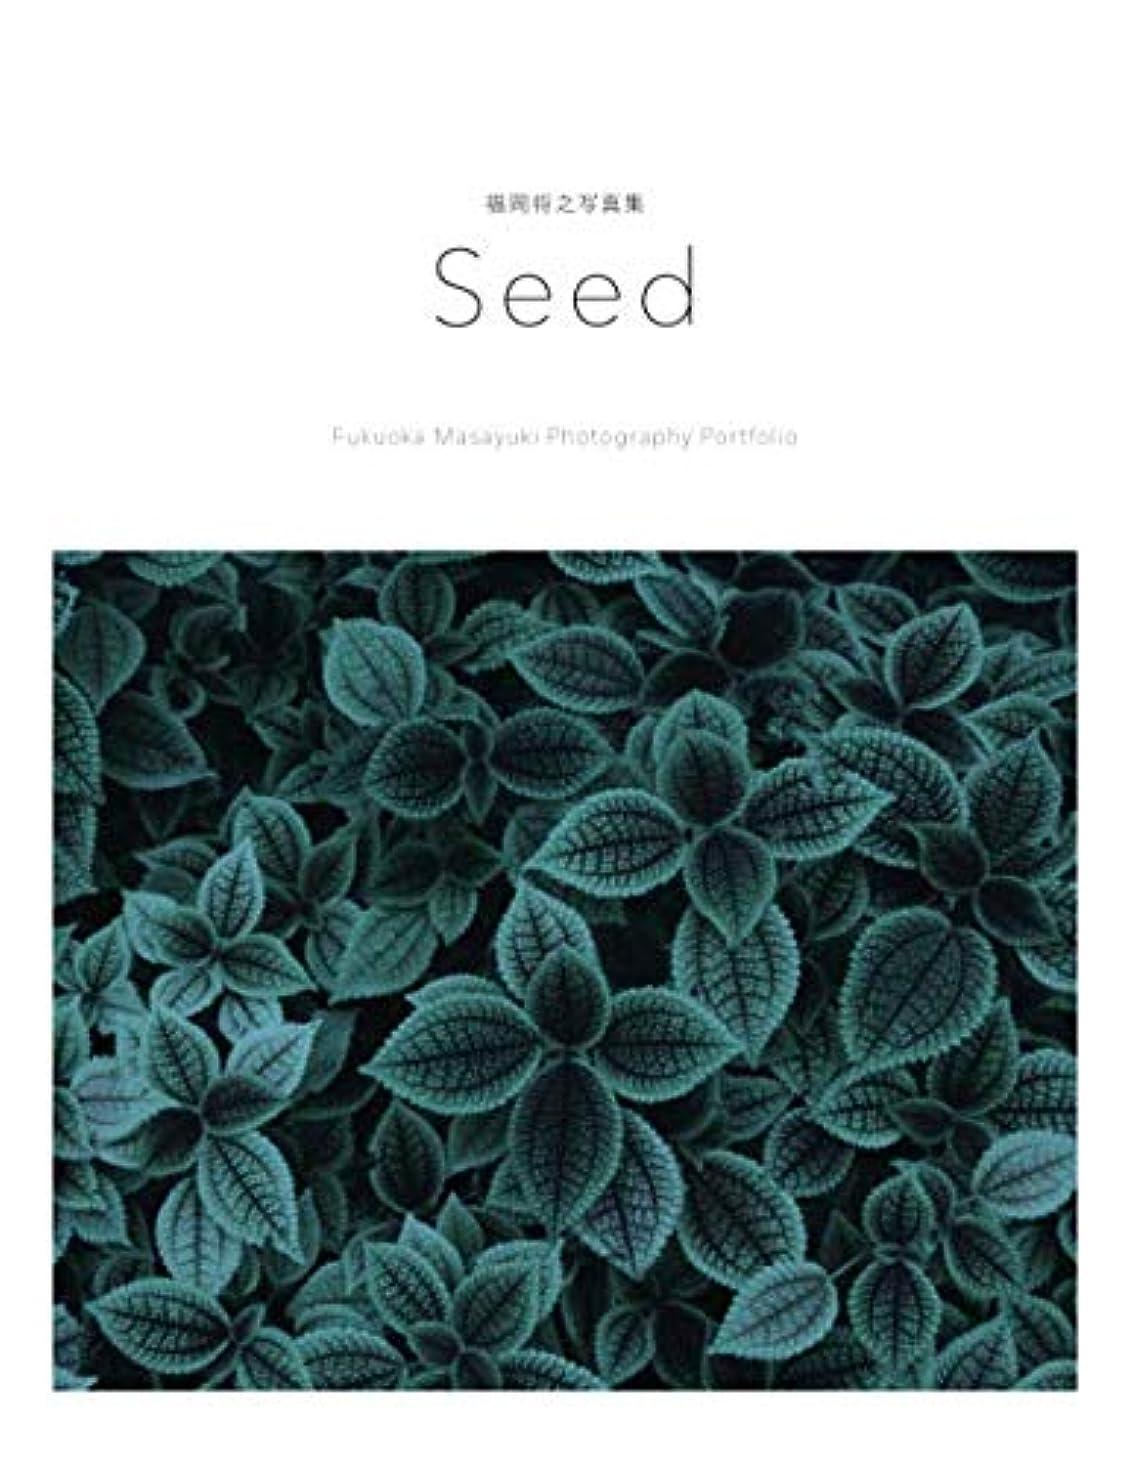 ドメイン購入家庭福岡将之写真集 Seed